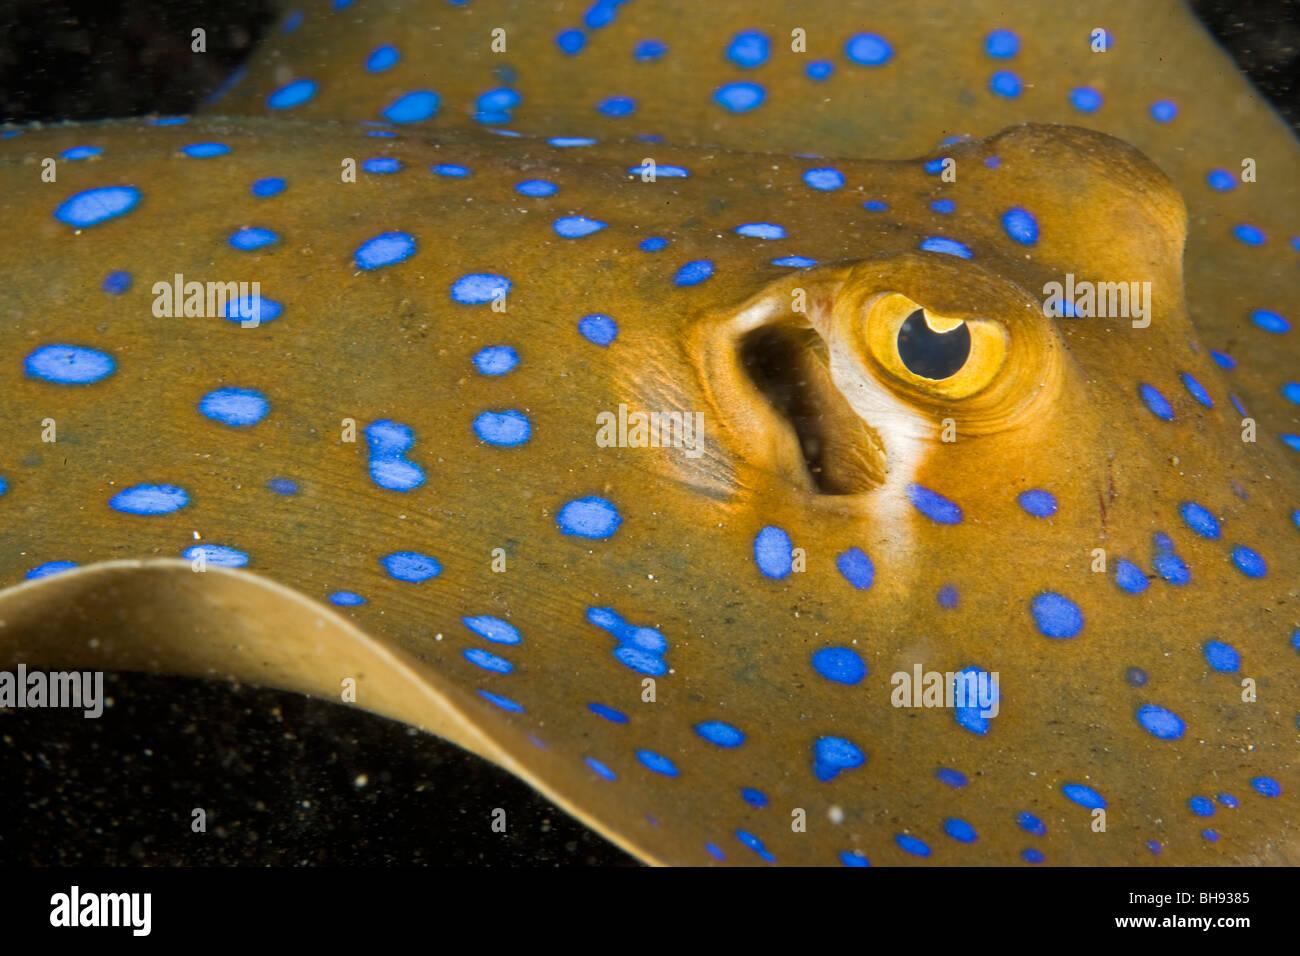 Blue Spotted Ray, Taeniura lymma, Lembeh strait, Sulawesi, Indonesia Immagini Stock